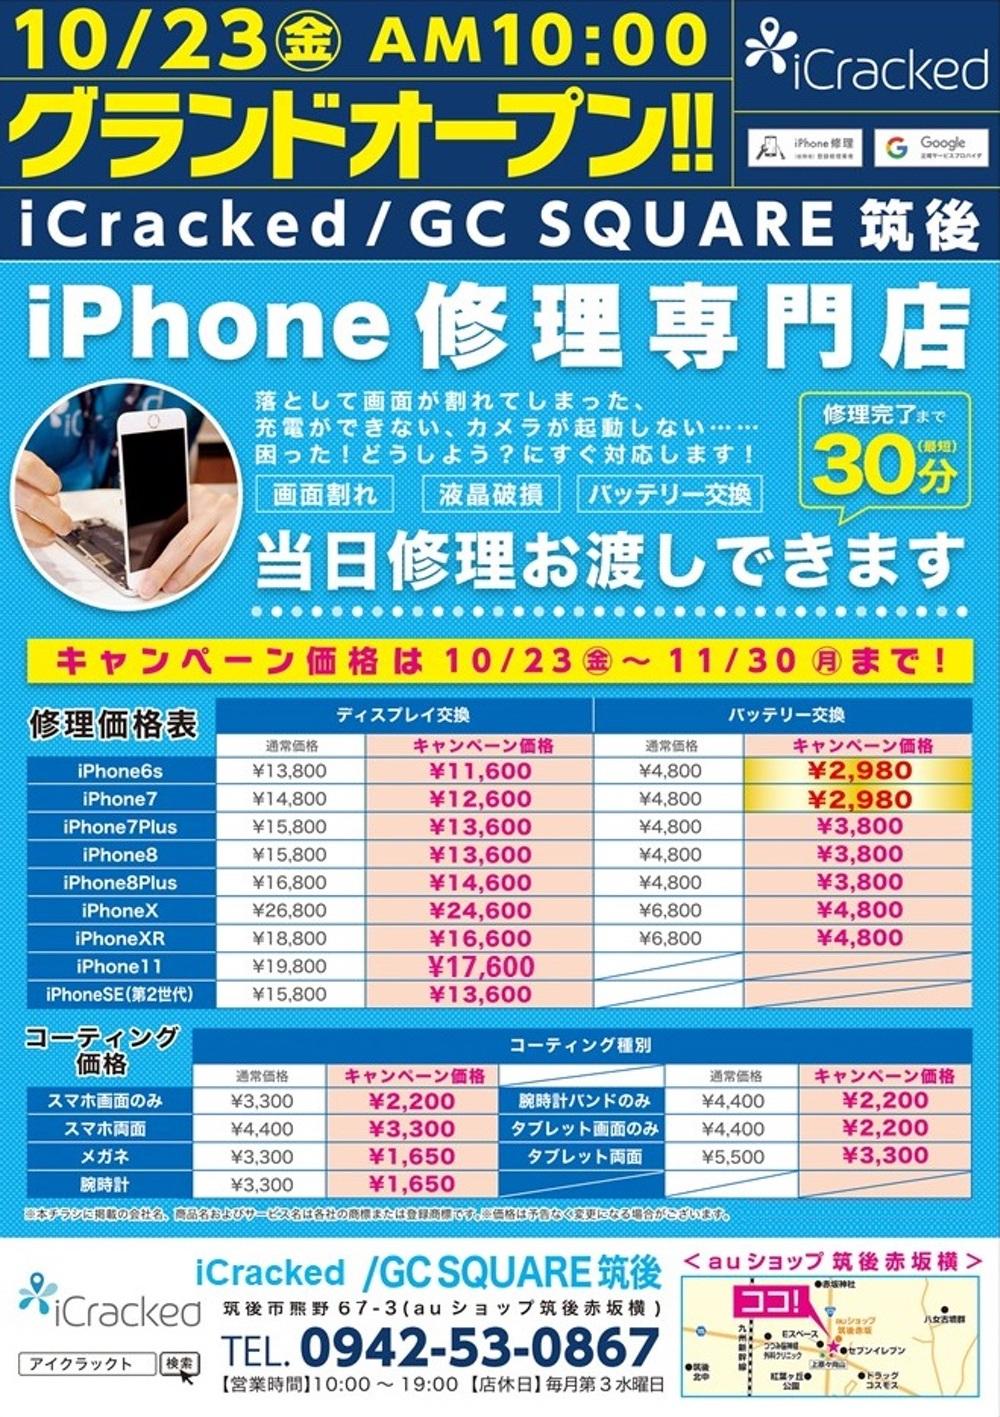 iCracked Store GC SQUARE筑後 iPhone修理価格表・コーティング価格